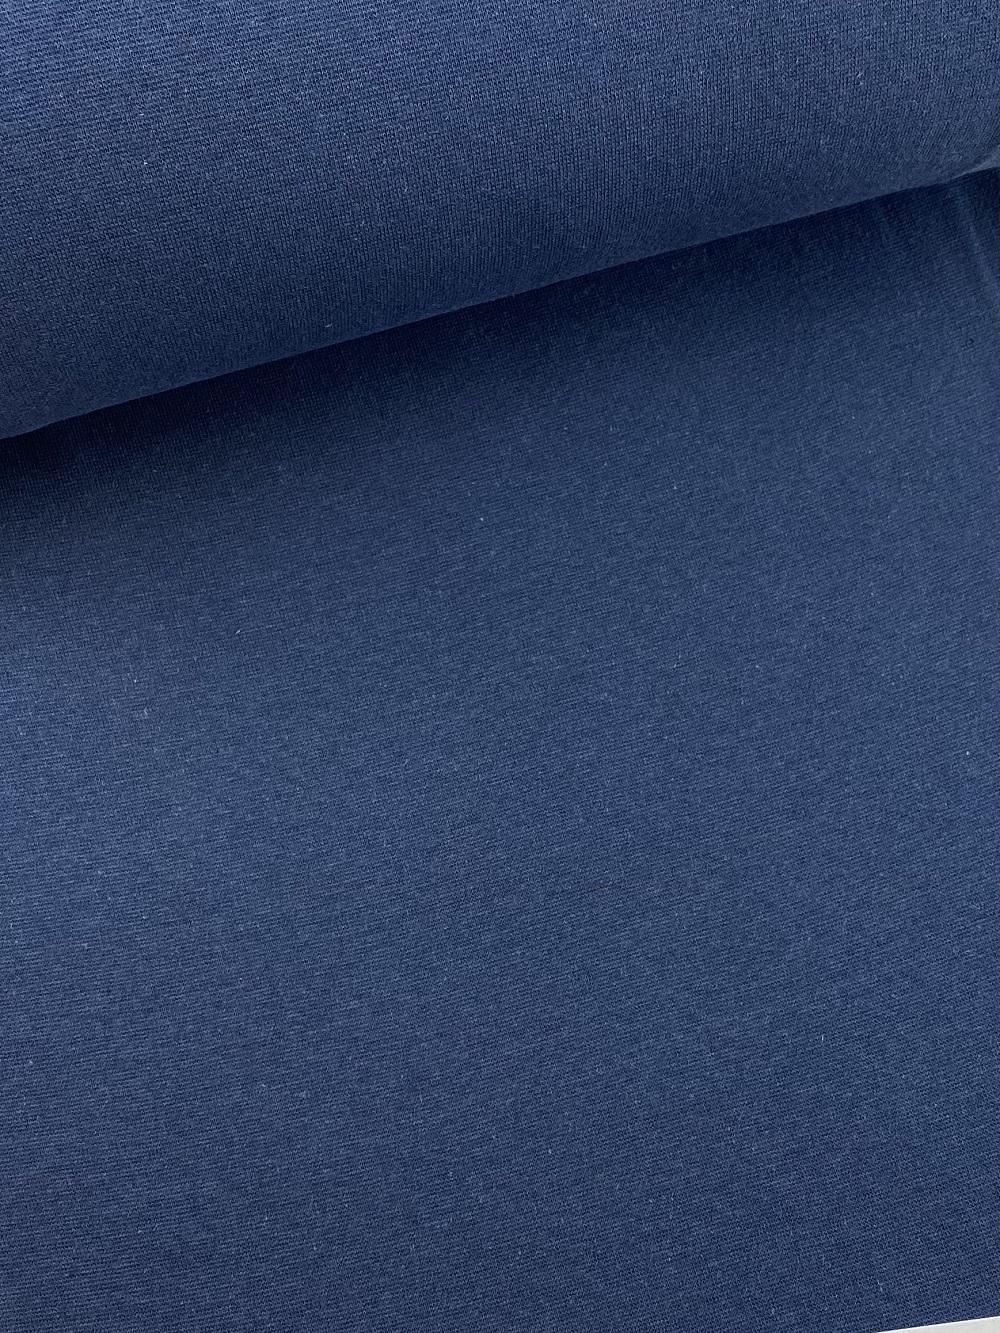 Bündchenware (glatt), dunkel jeansblau. Art. SW10639